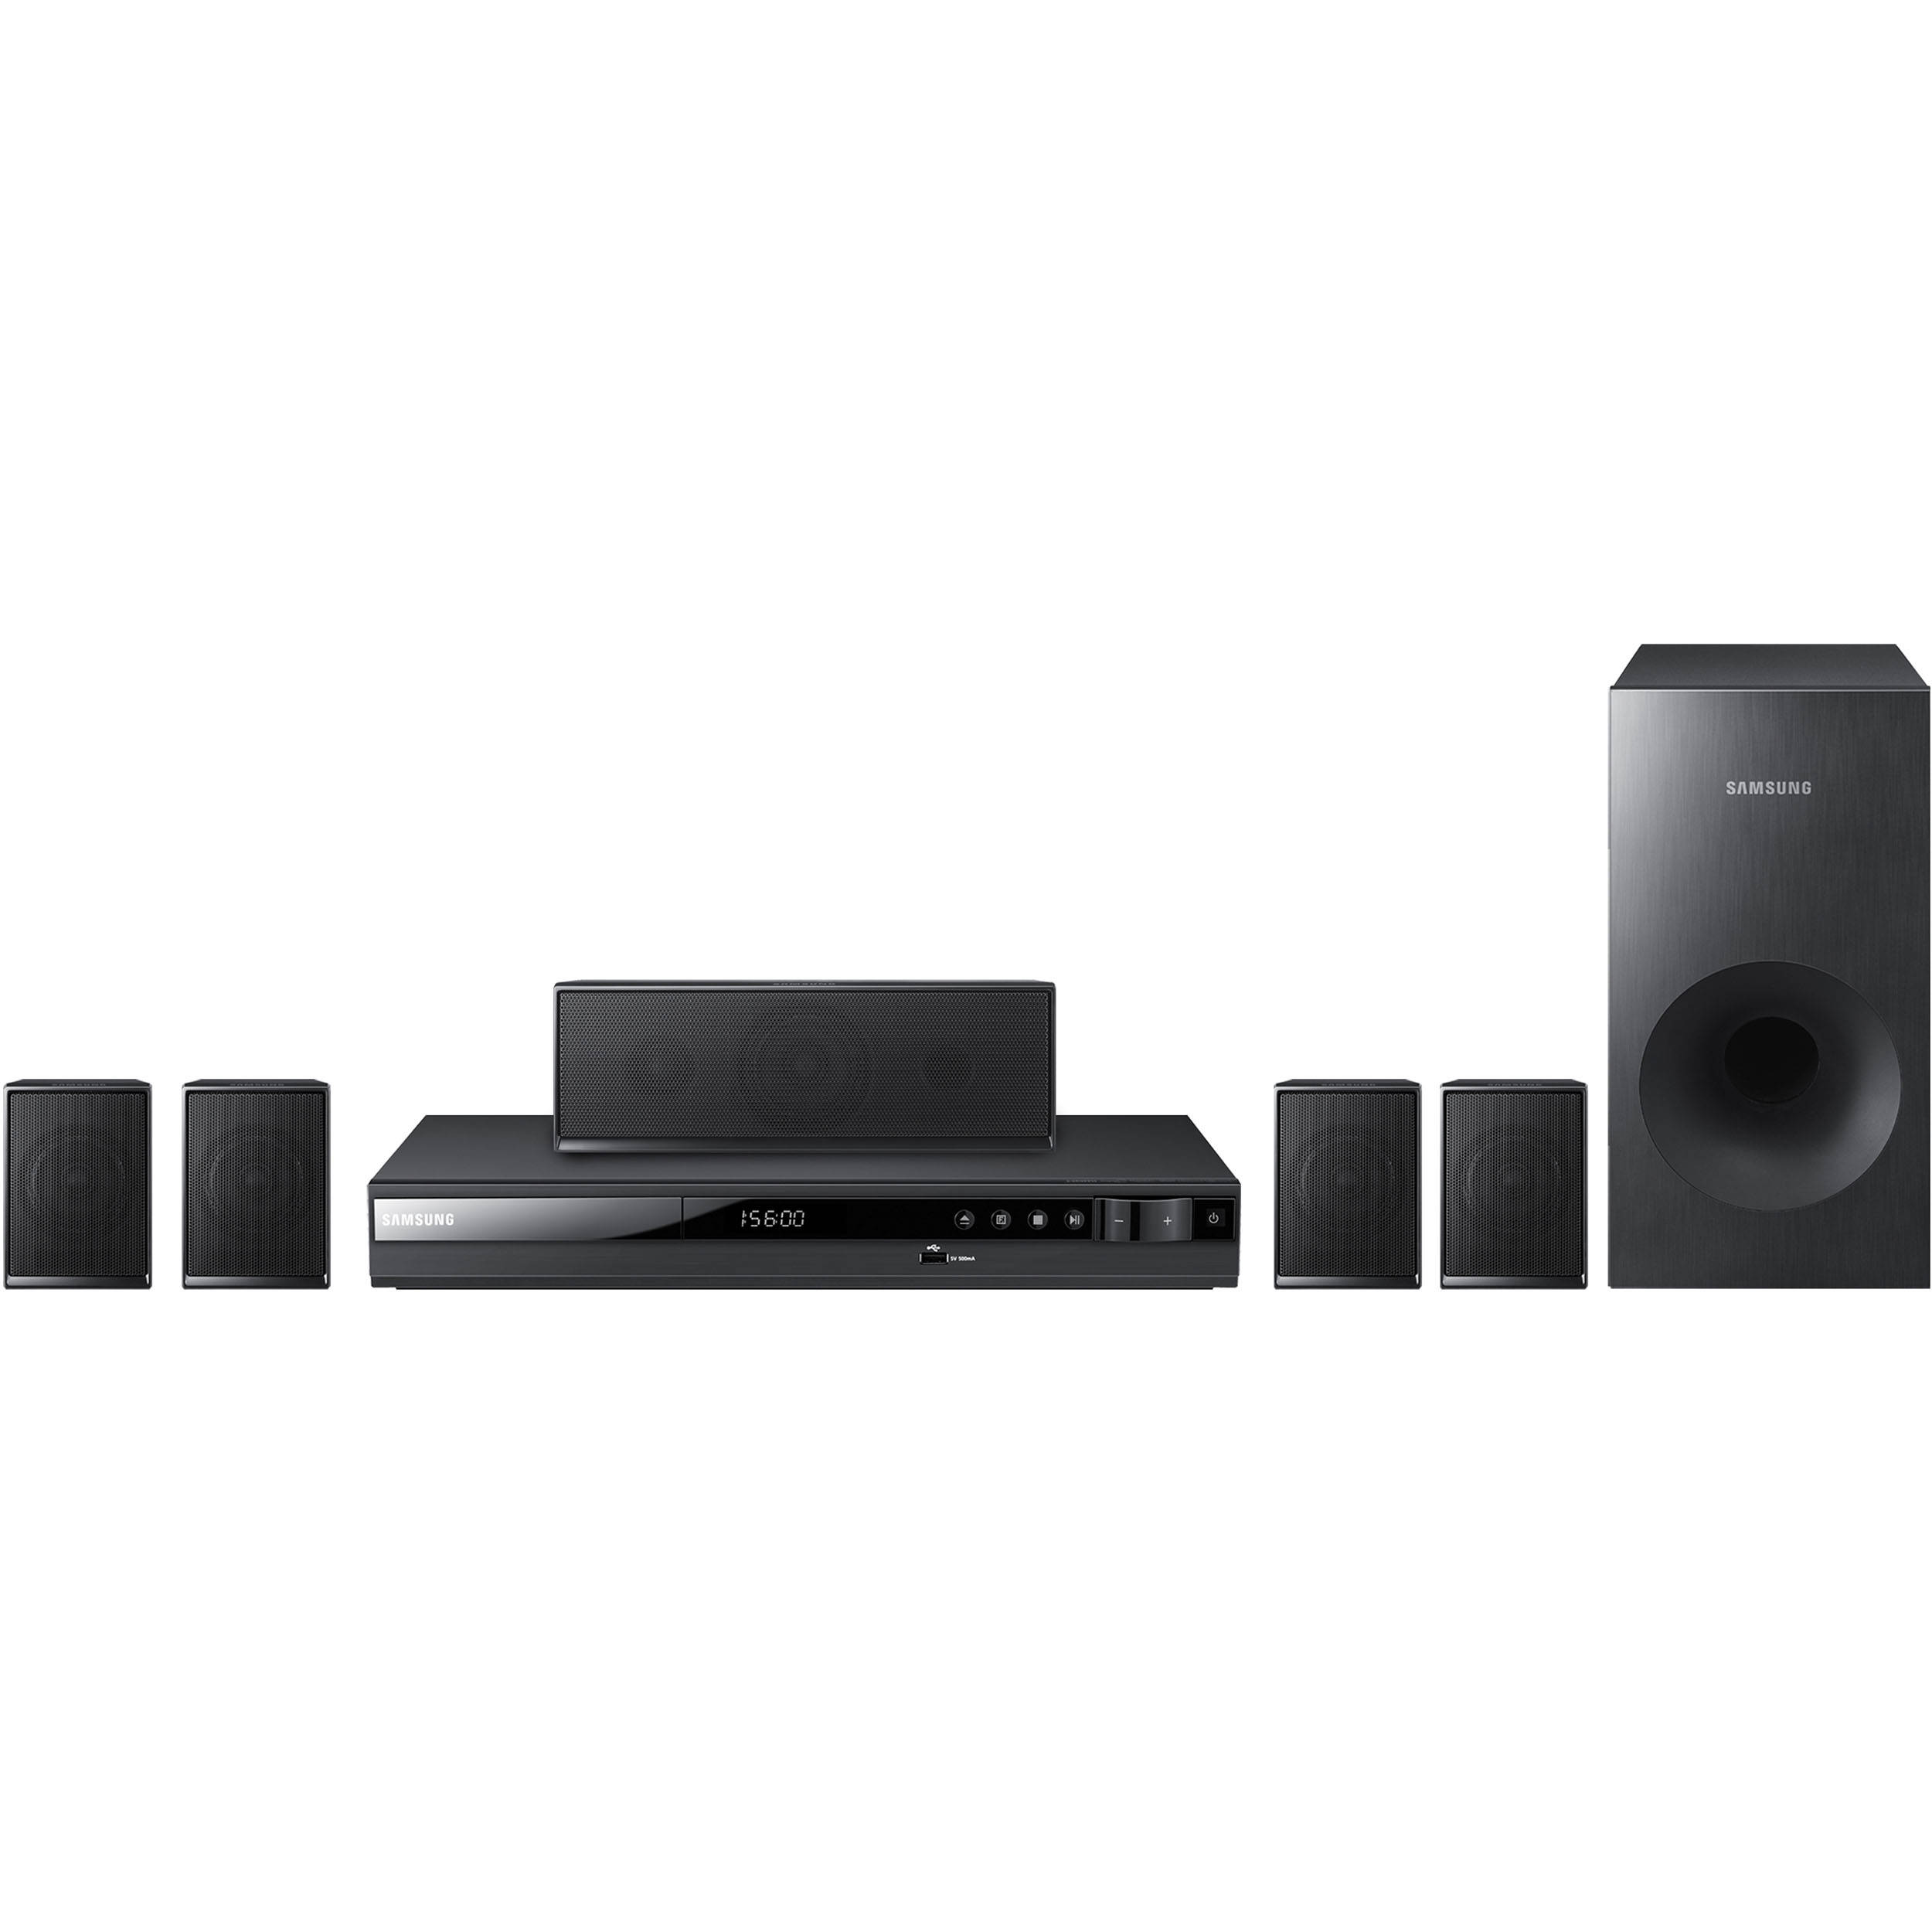 samsung ht e350 digital home entertainment system ht e350 b h. Black Bedroom Furniture Sets. Home Design Ideas